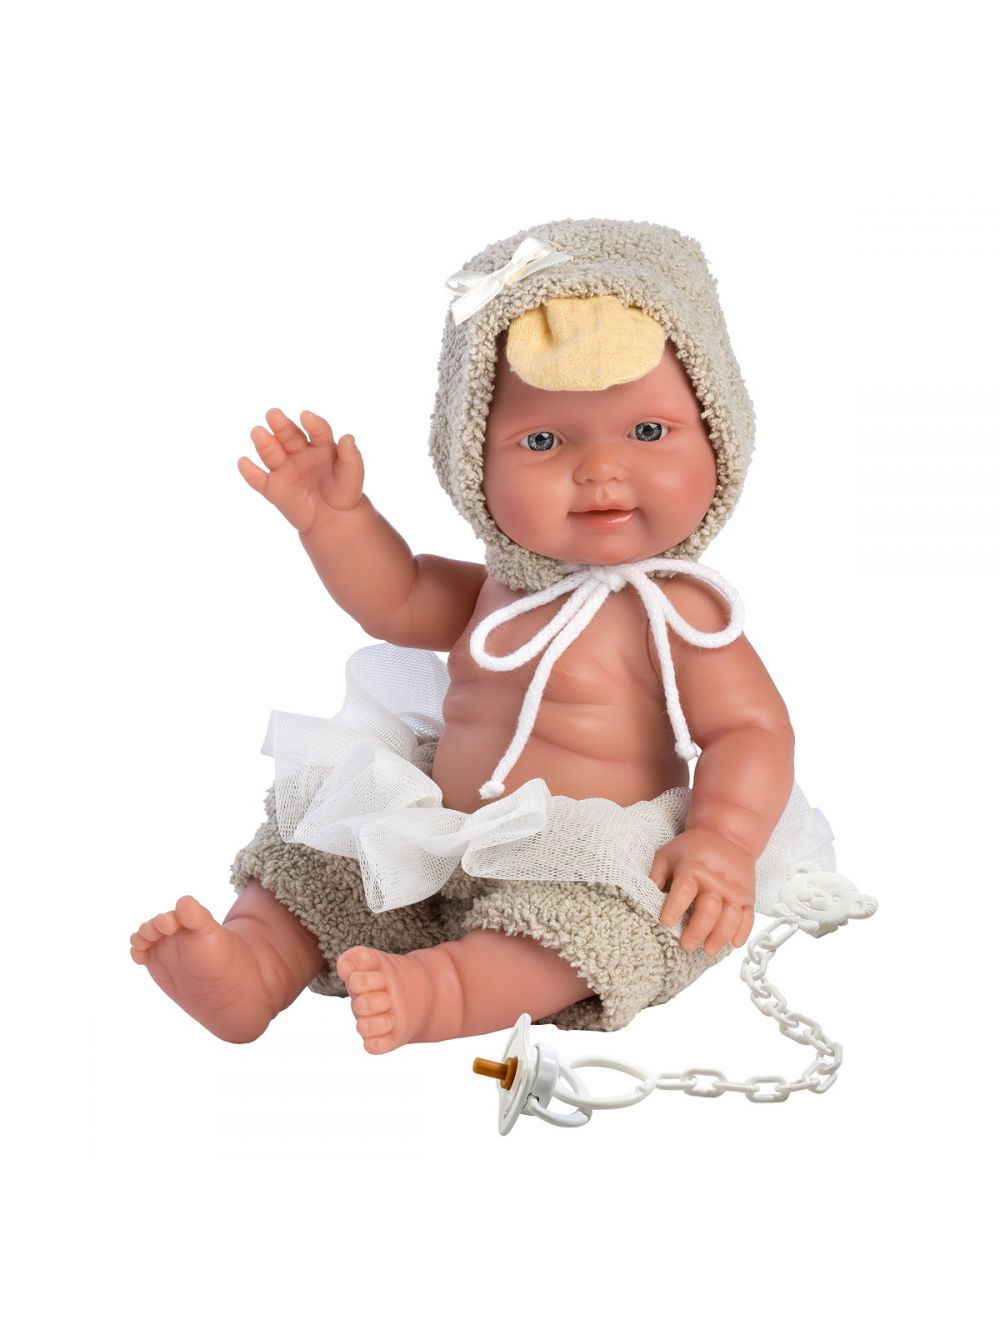 Llorens 26282 Lalka bobas 26 cm chłopiec beżowa kaczor FB